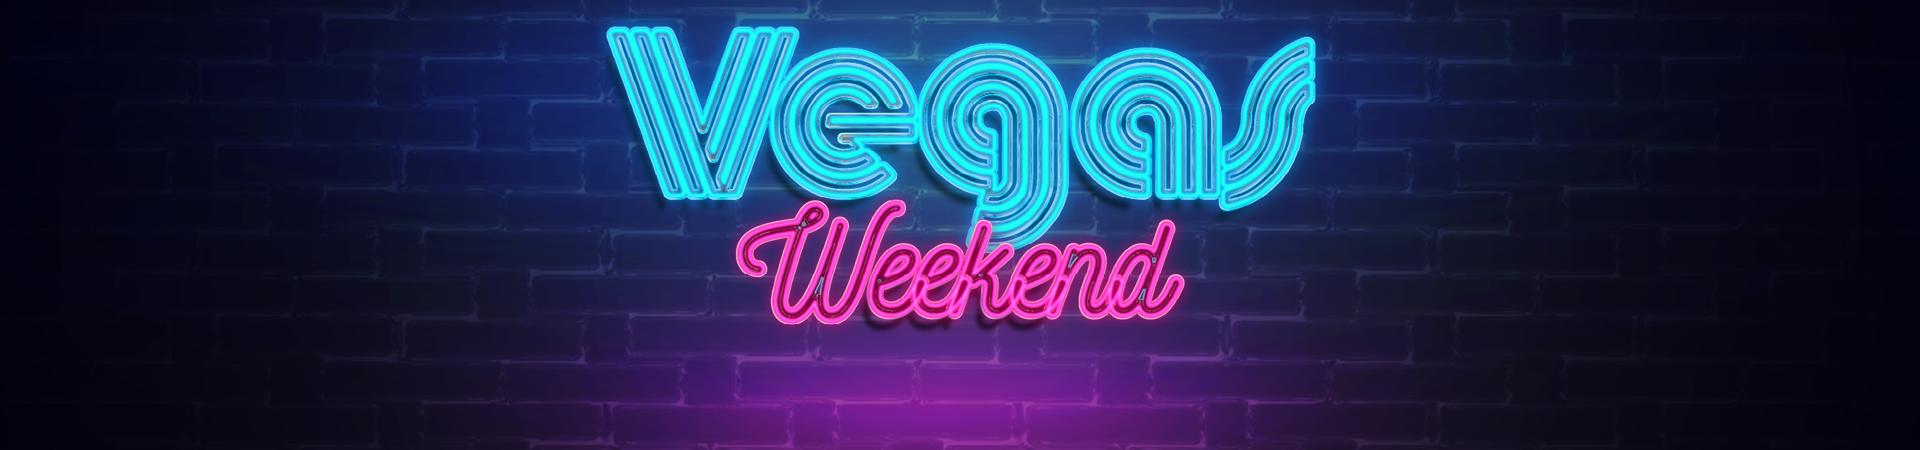 Weekend Promotional Calendar